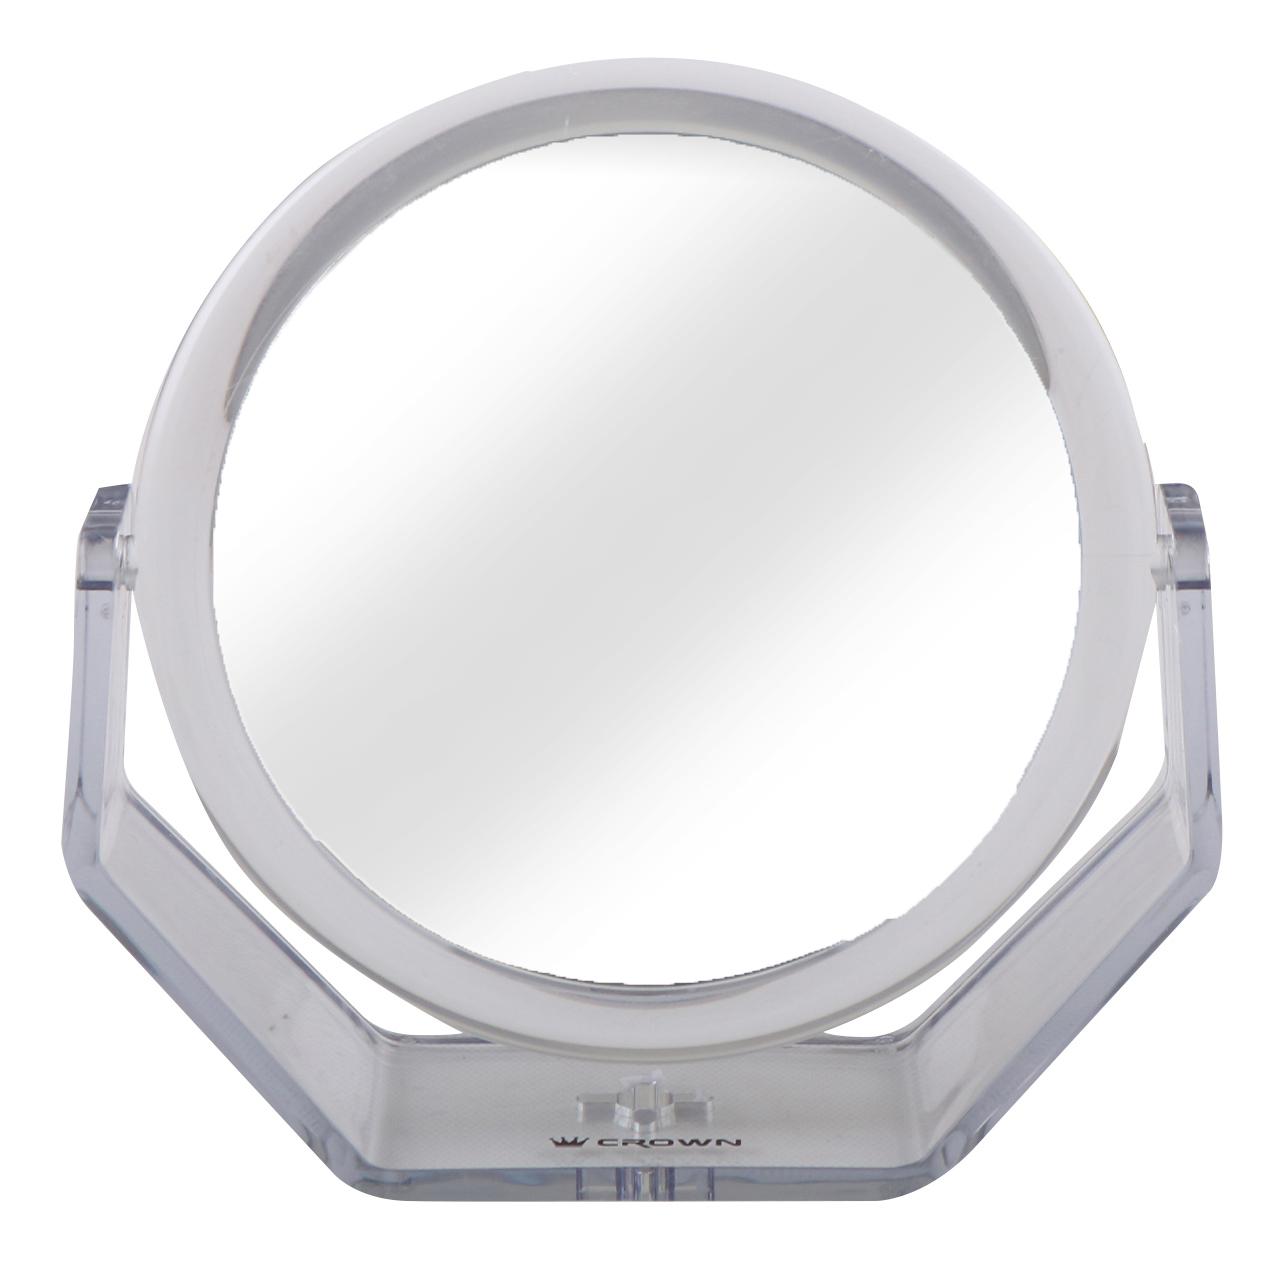 آینه آرایشی کرون مدل 1023